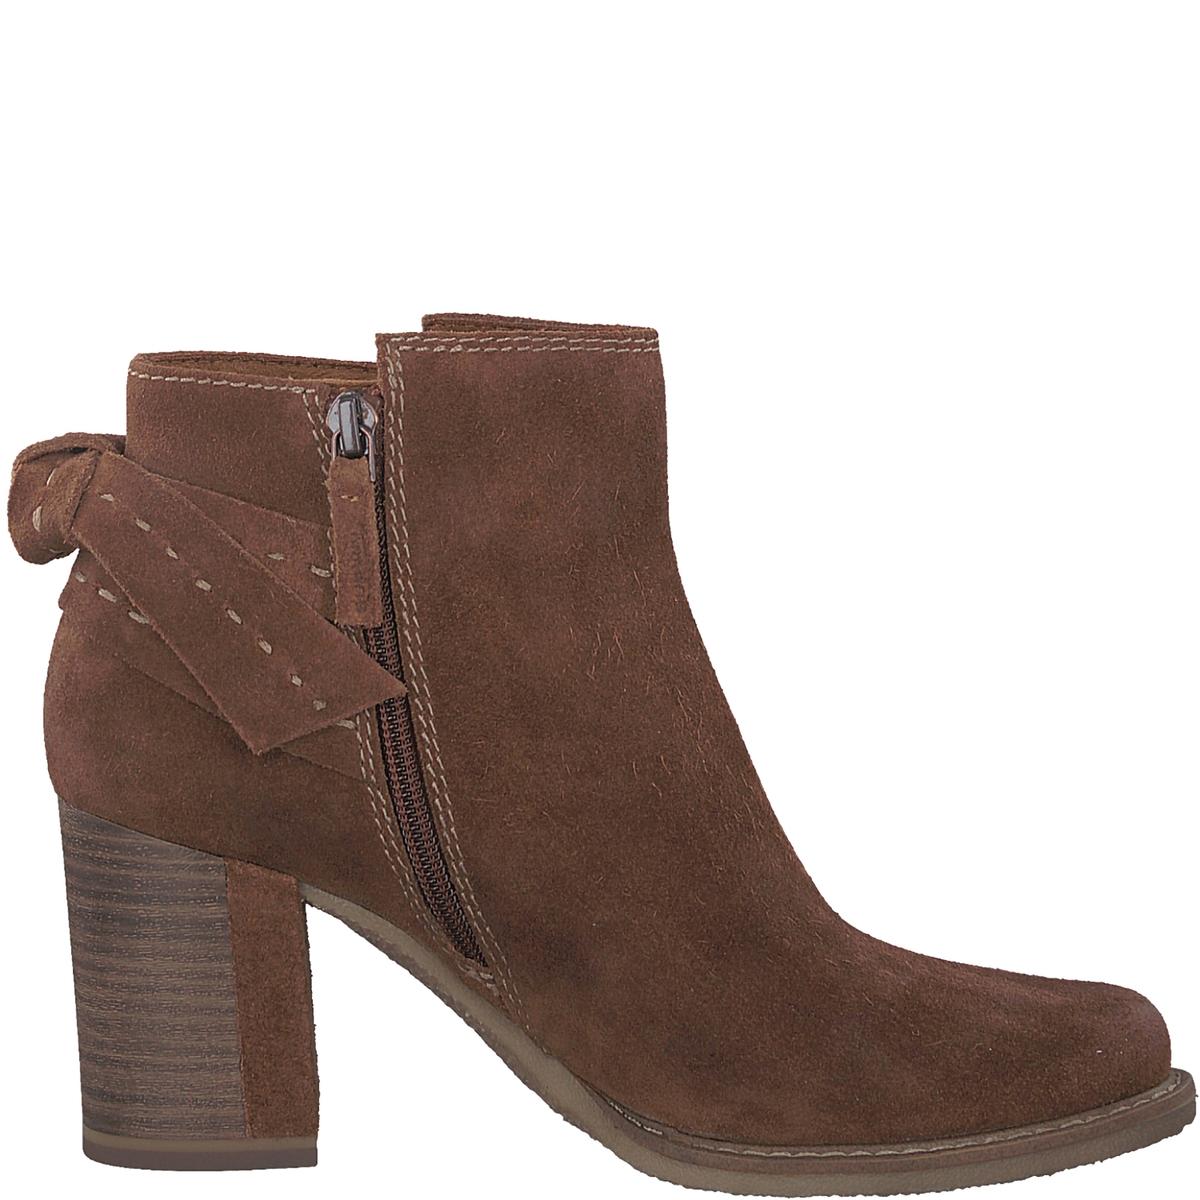 Ботильоны кожаные Rhea цены онлайн